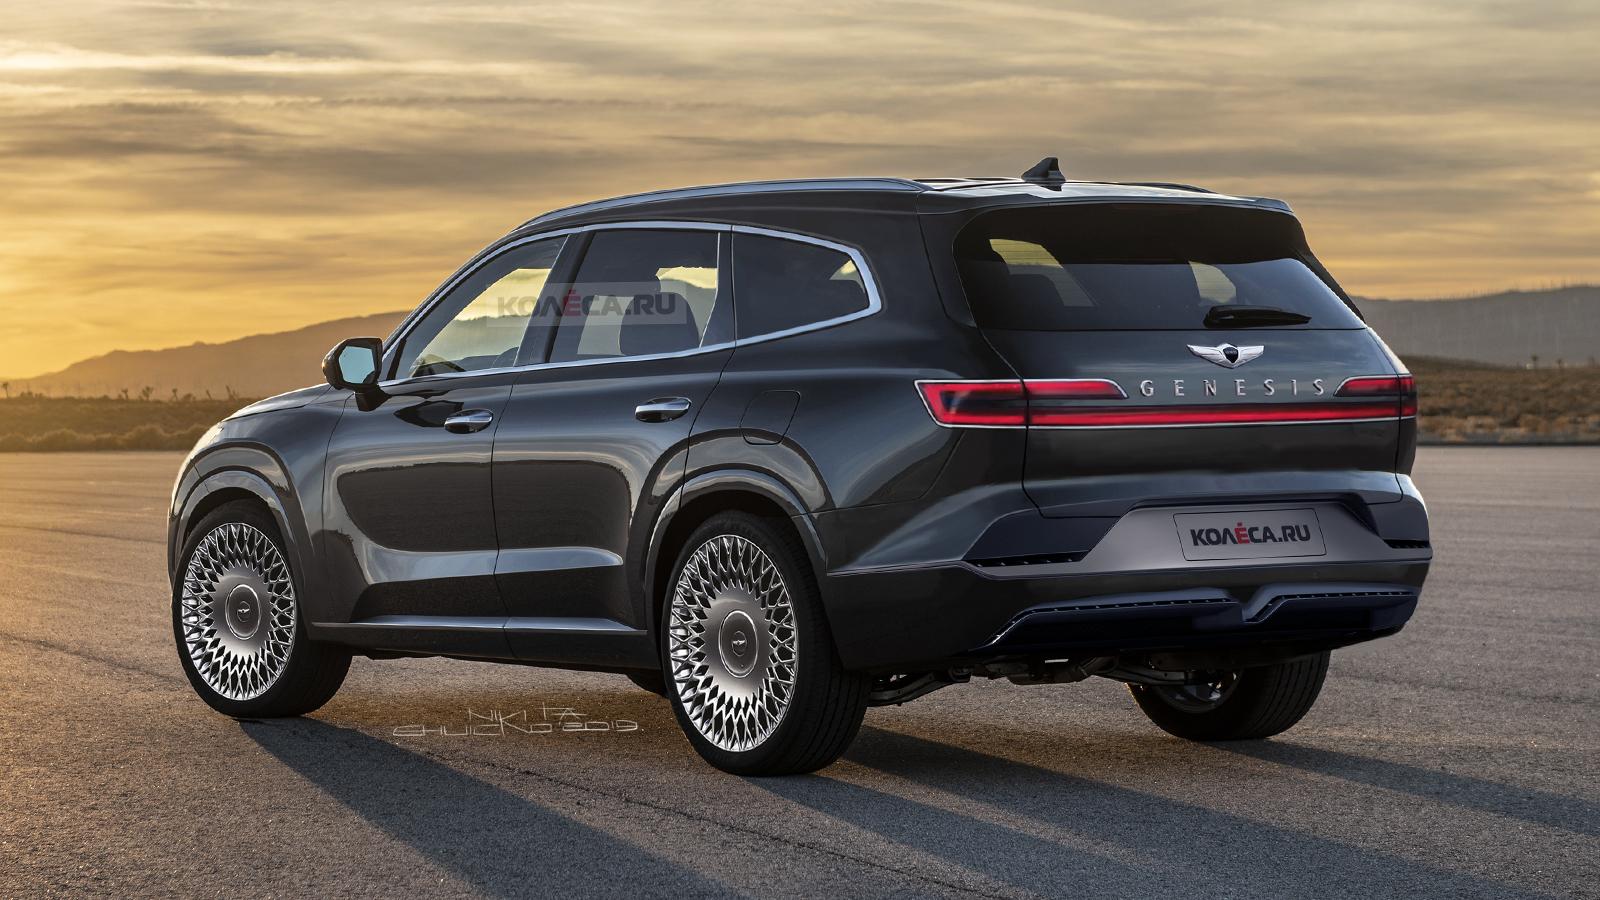 Genesis-SUV-rear2